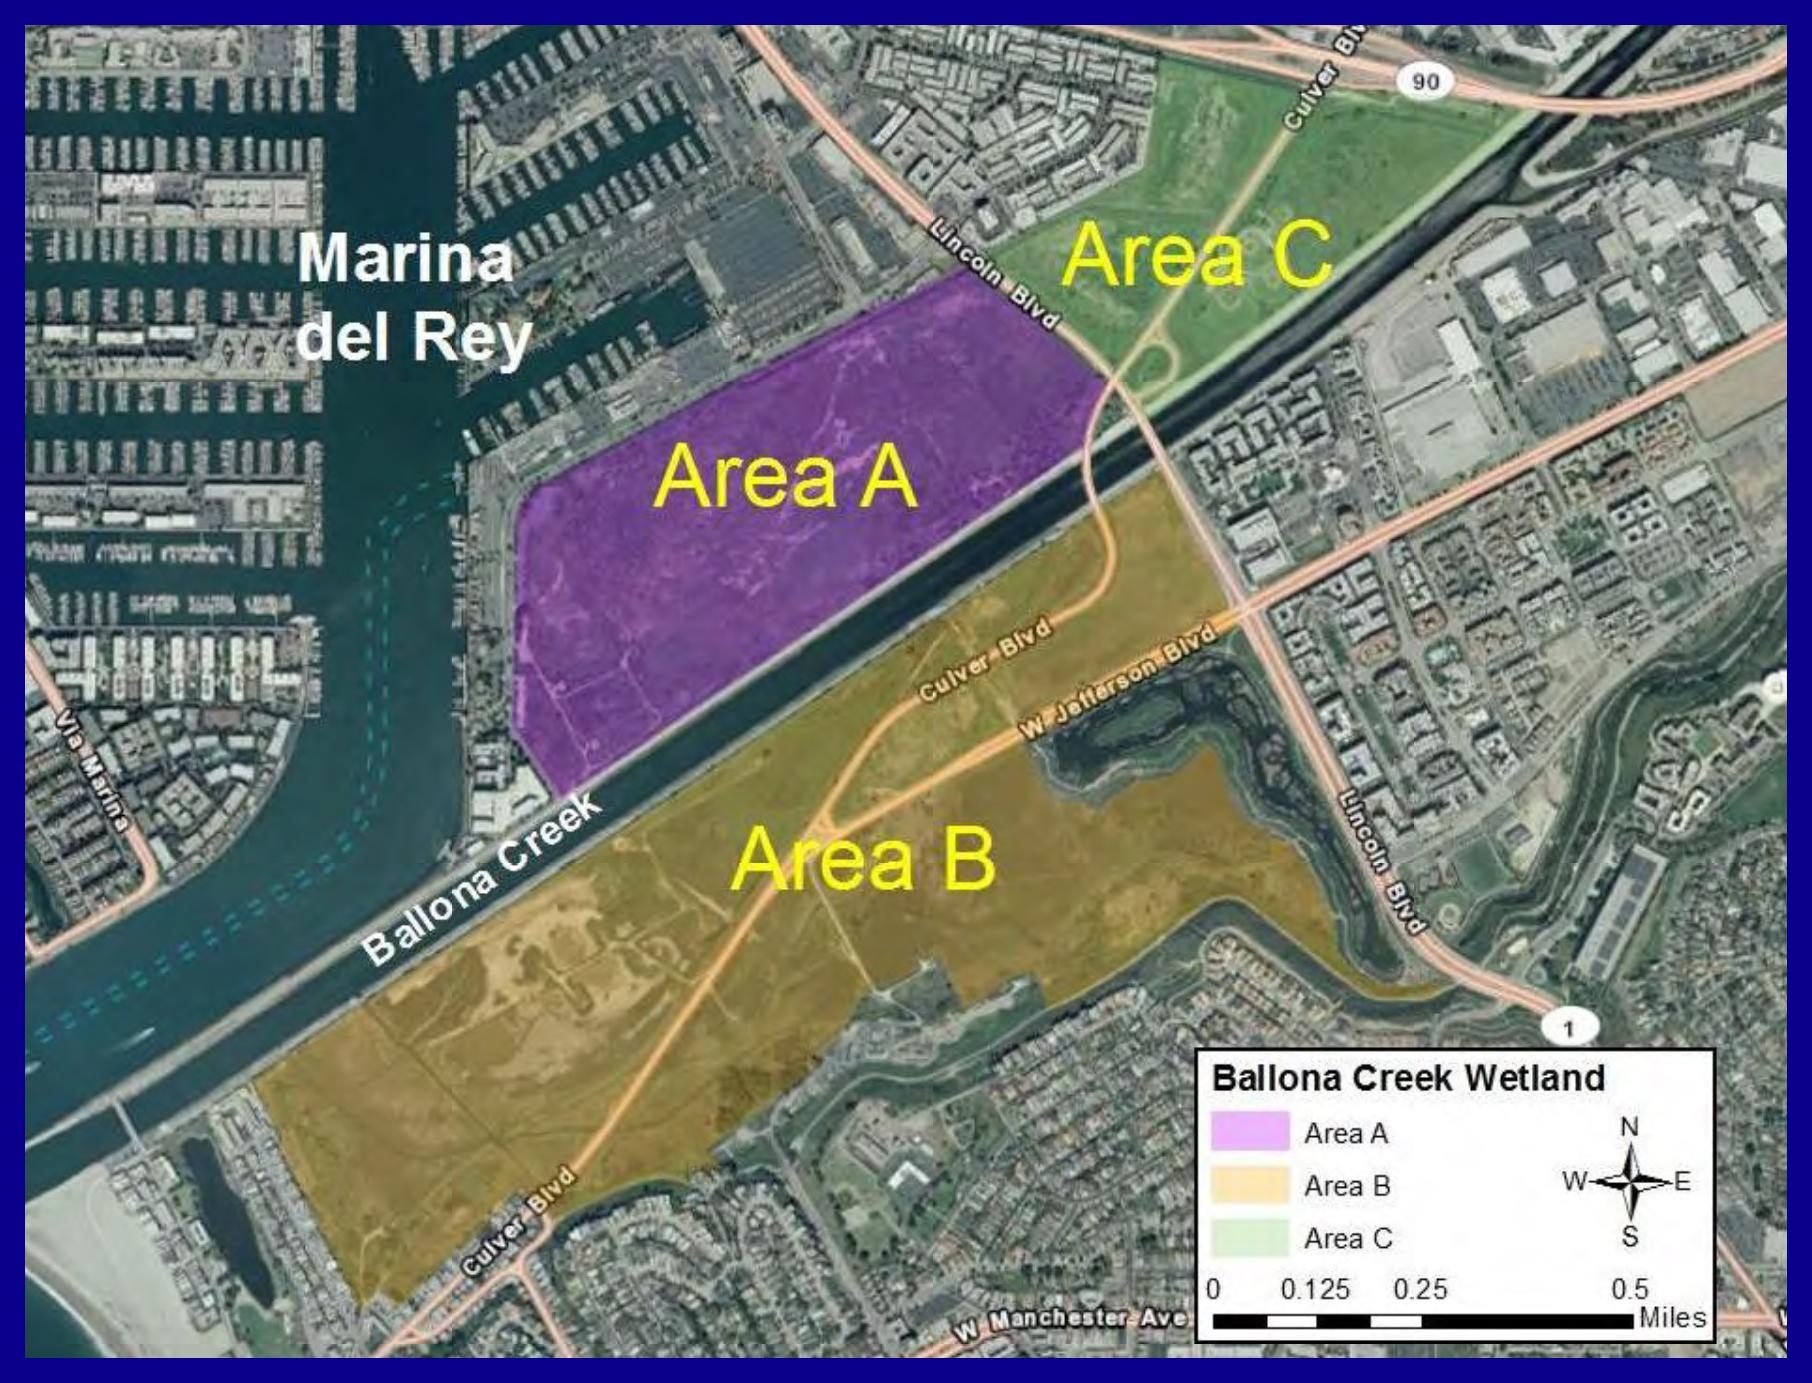 Ballona Wetlands Area A, B, C Map